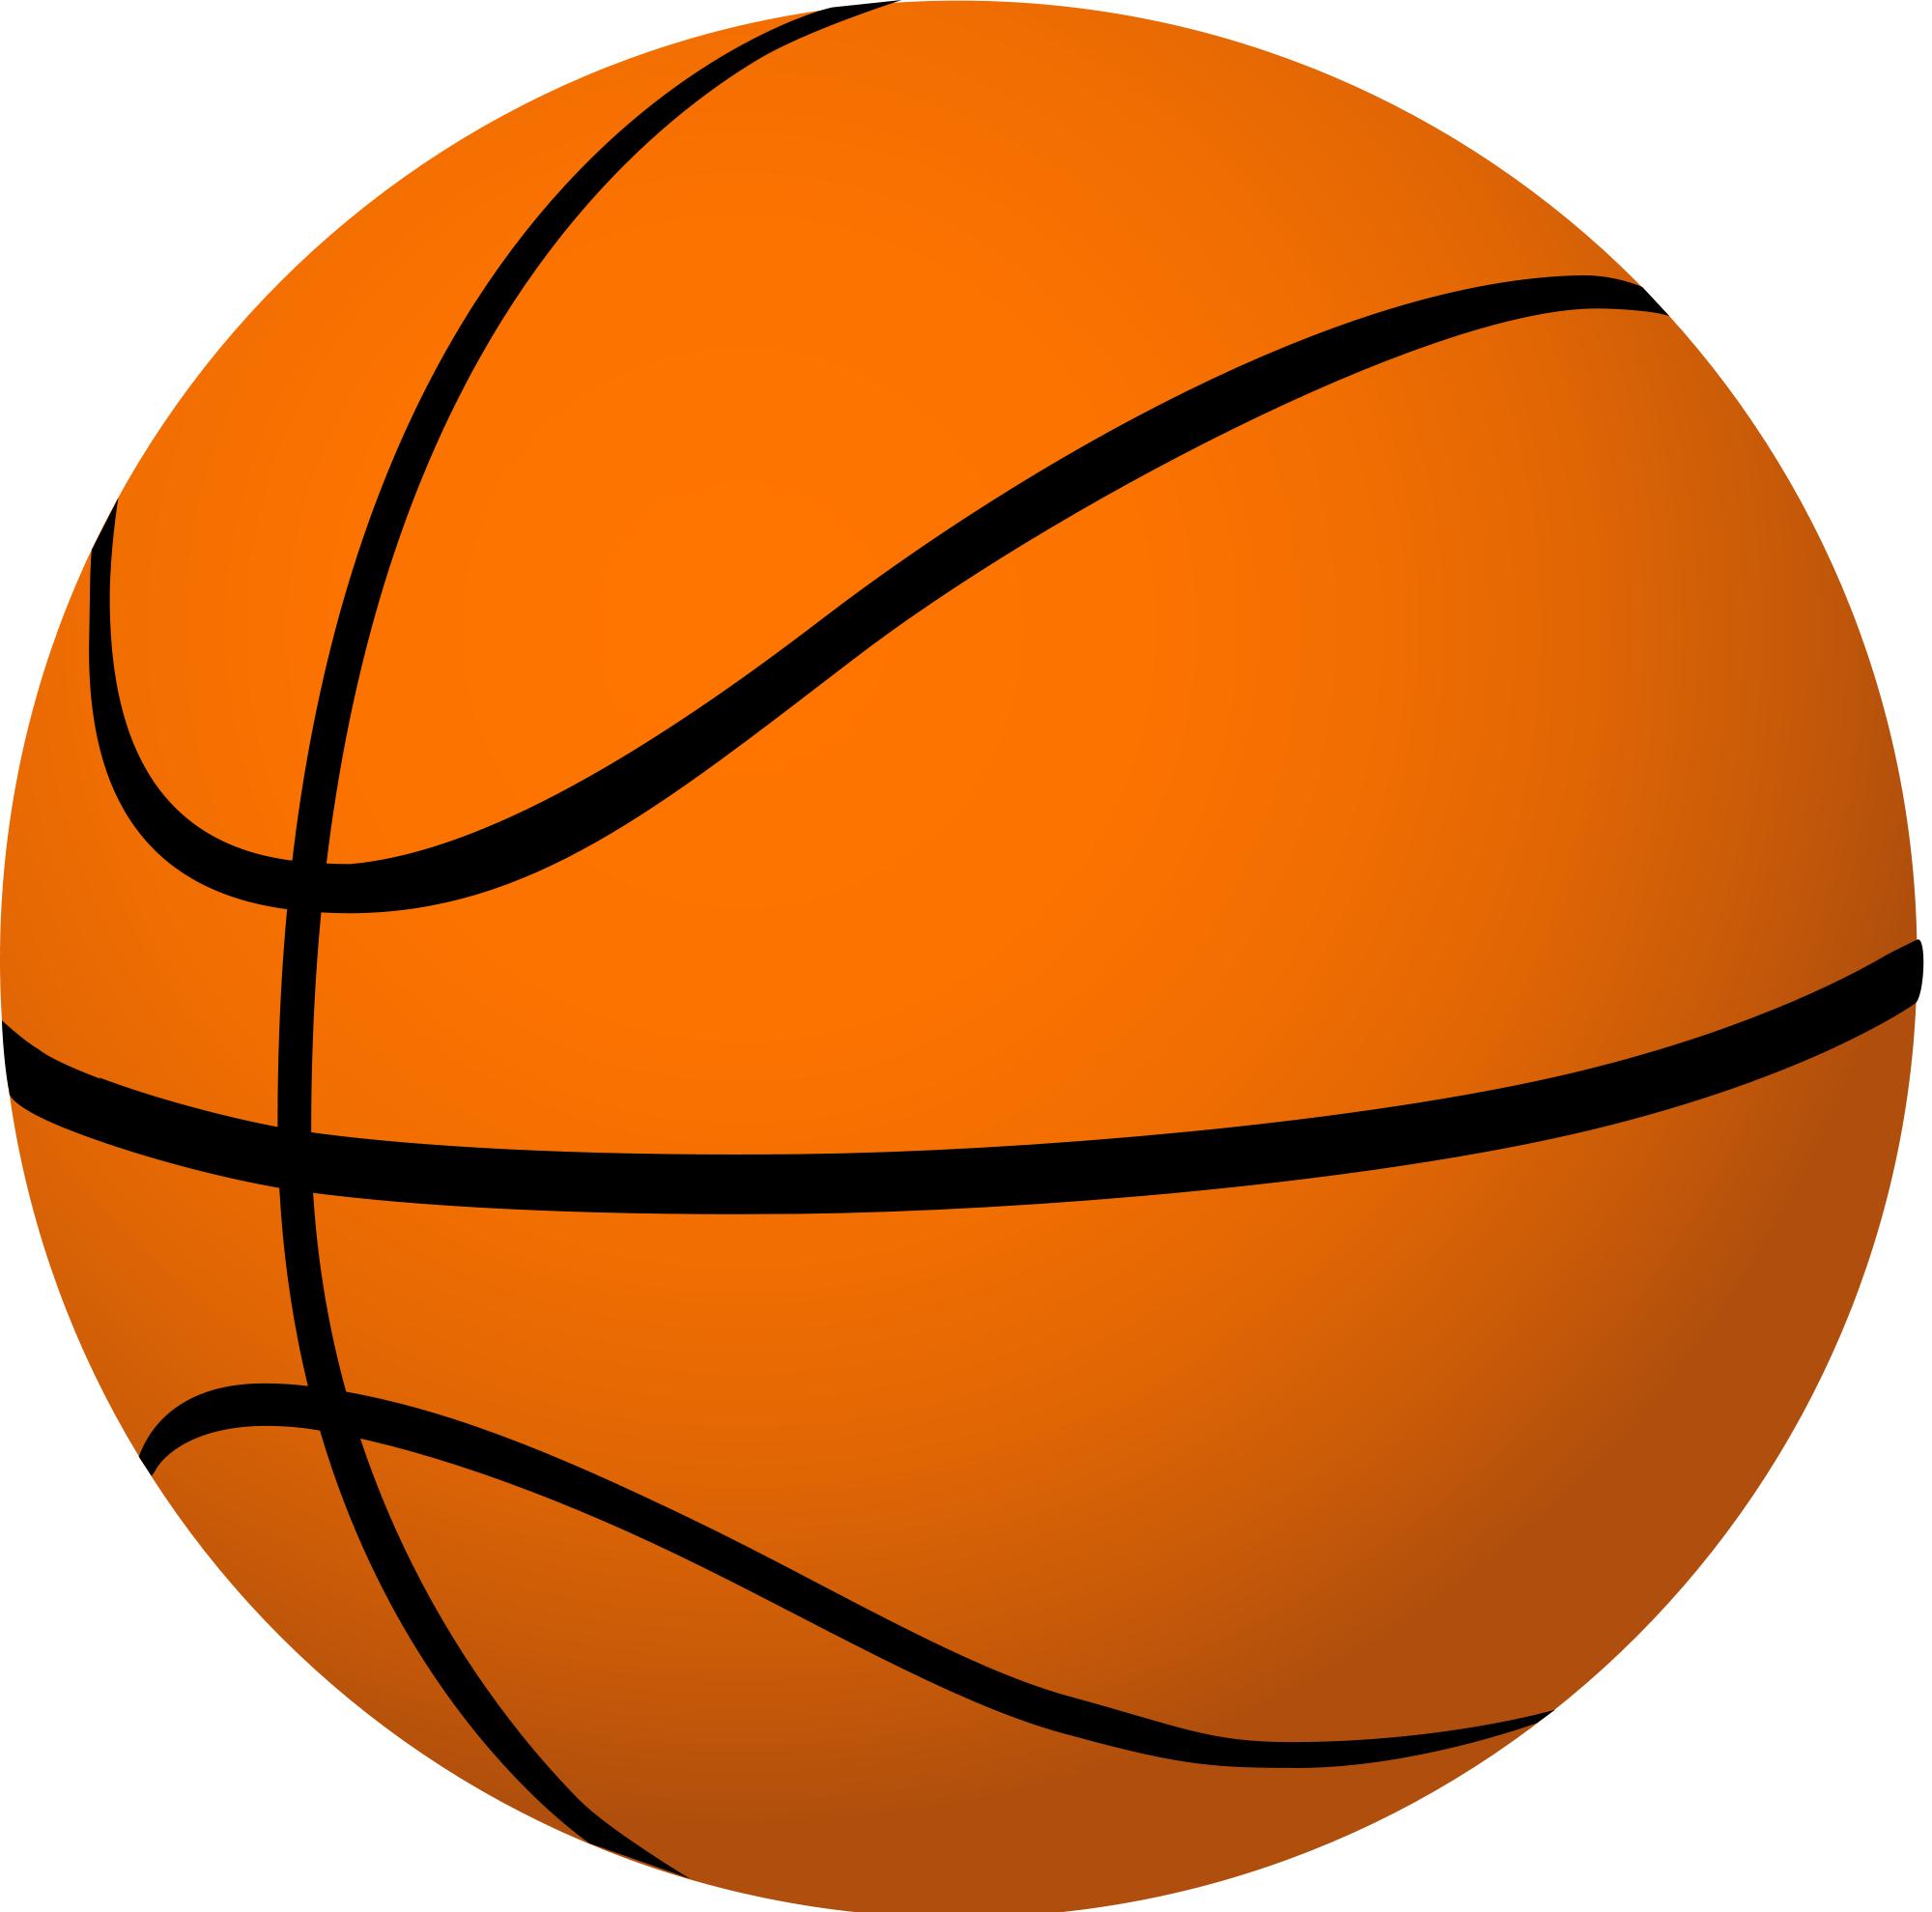 Basketball Royalty Free Download Free Printable - Rr Collections - Free Printable Basketball Court